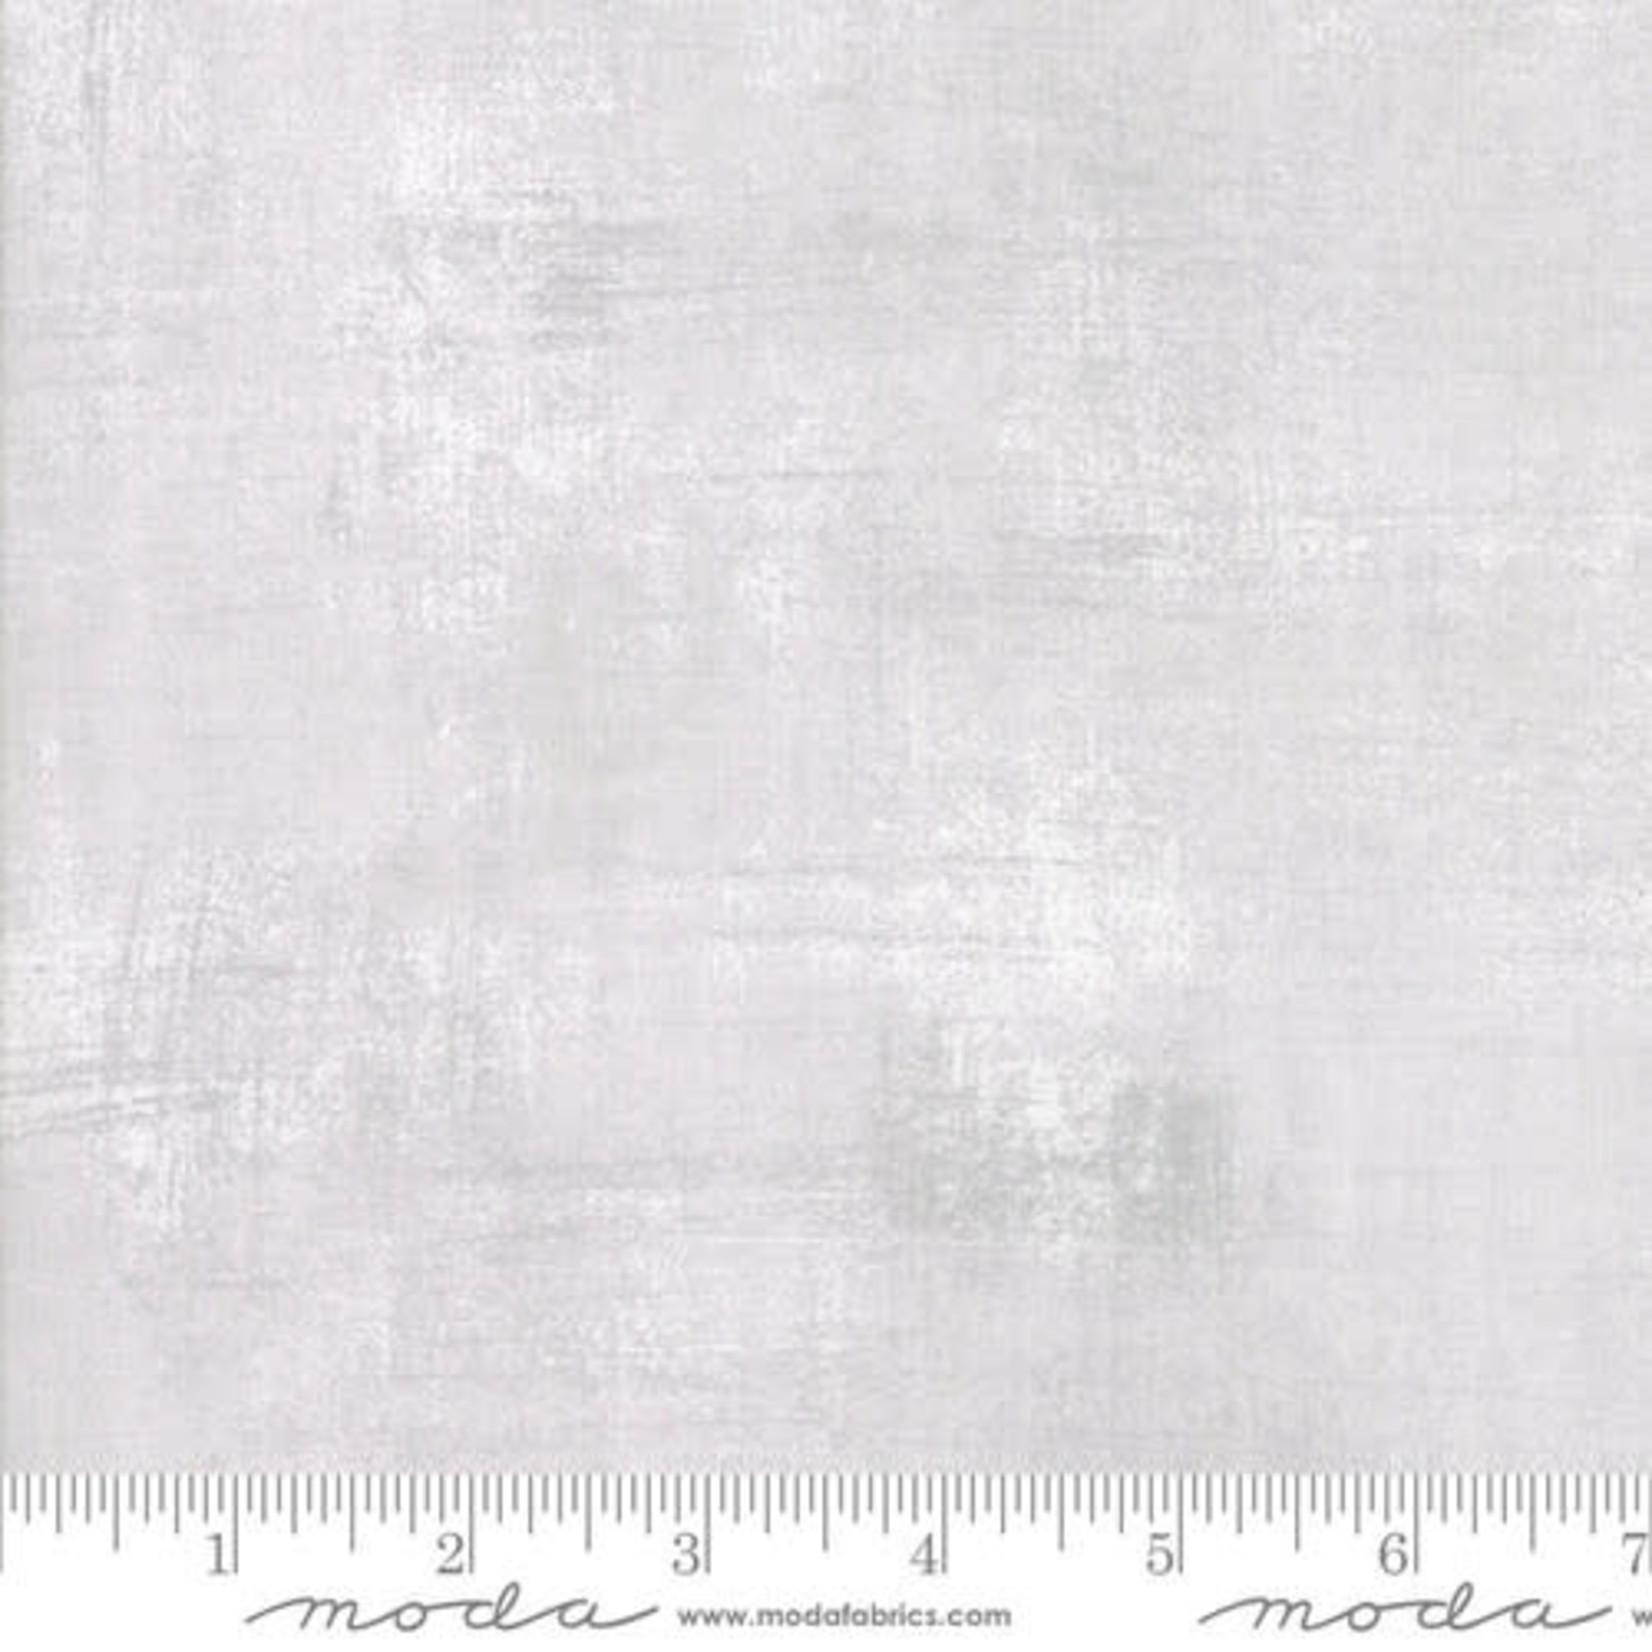 Moda BasicGray - Grunge - Gray Paper